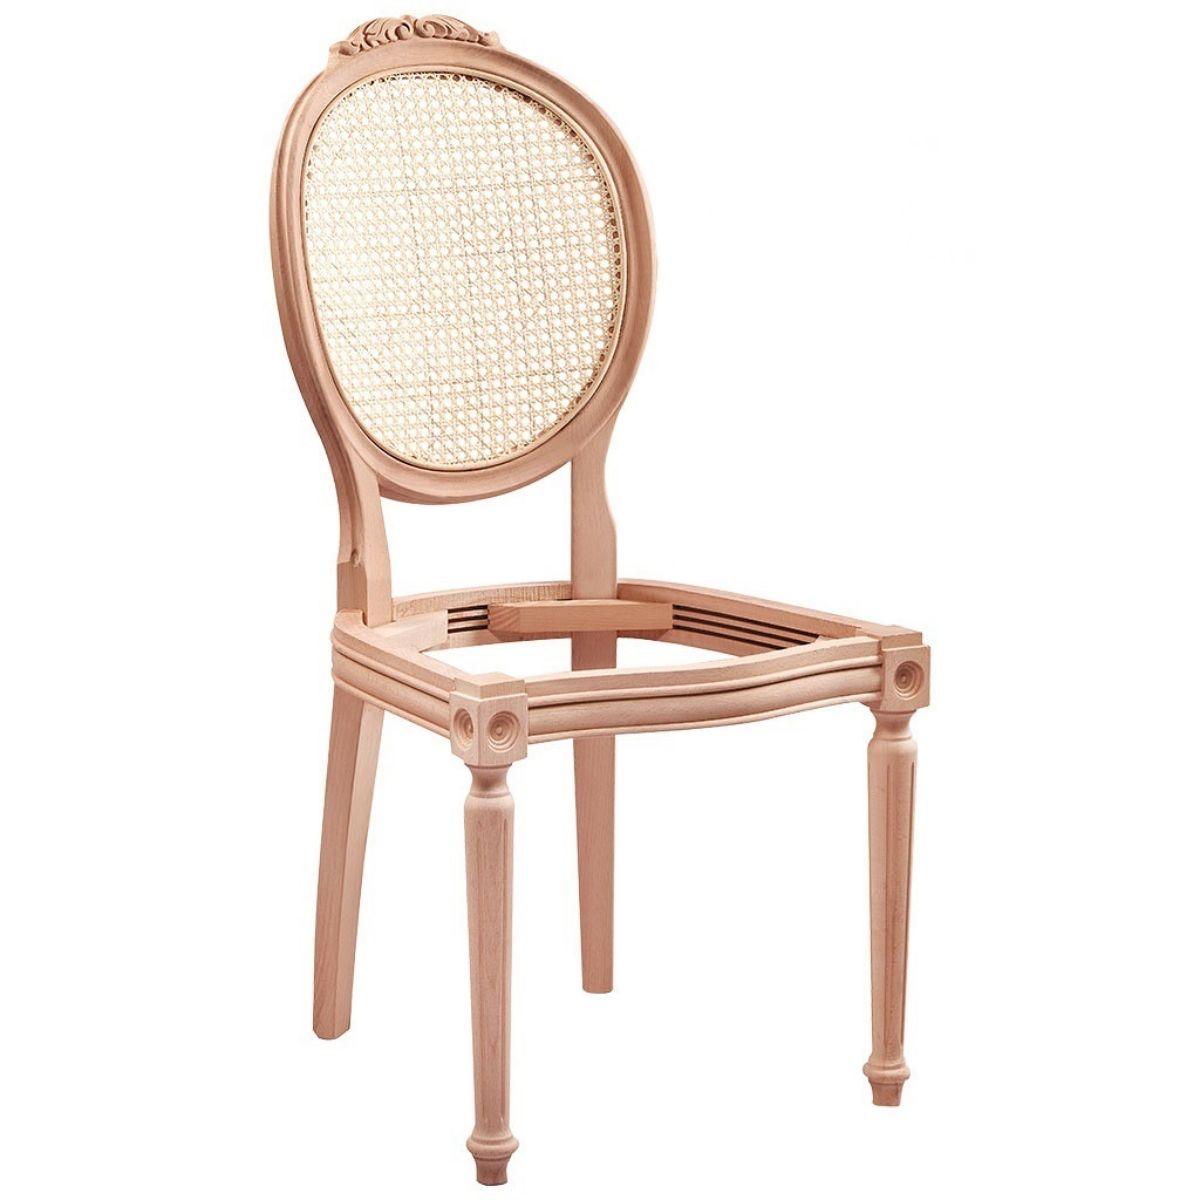 madalyon-oymalı-hasirli-torna-ayak-sandalye-ardic-mobilya-aksesuar-ahsap-hasir-sandalye-42229